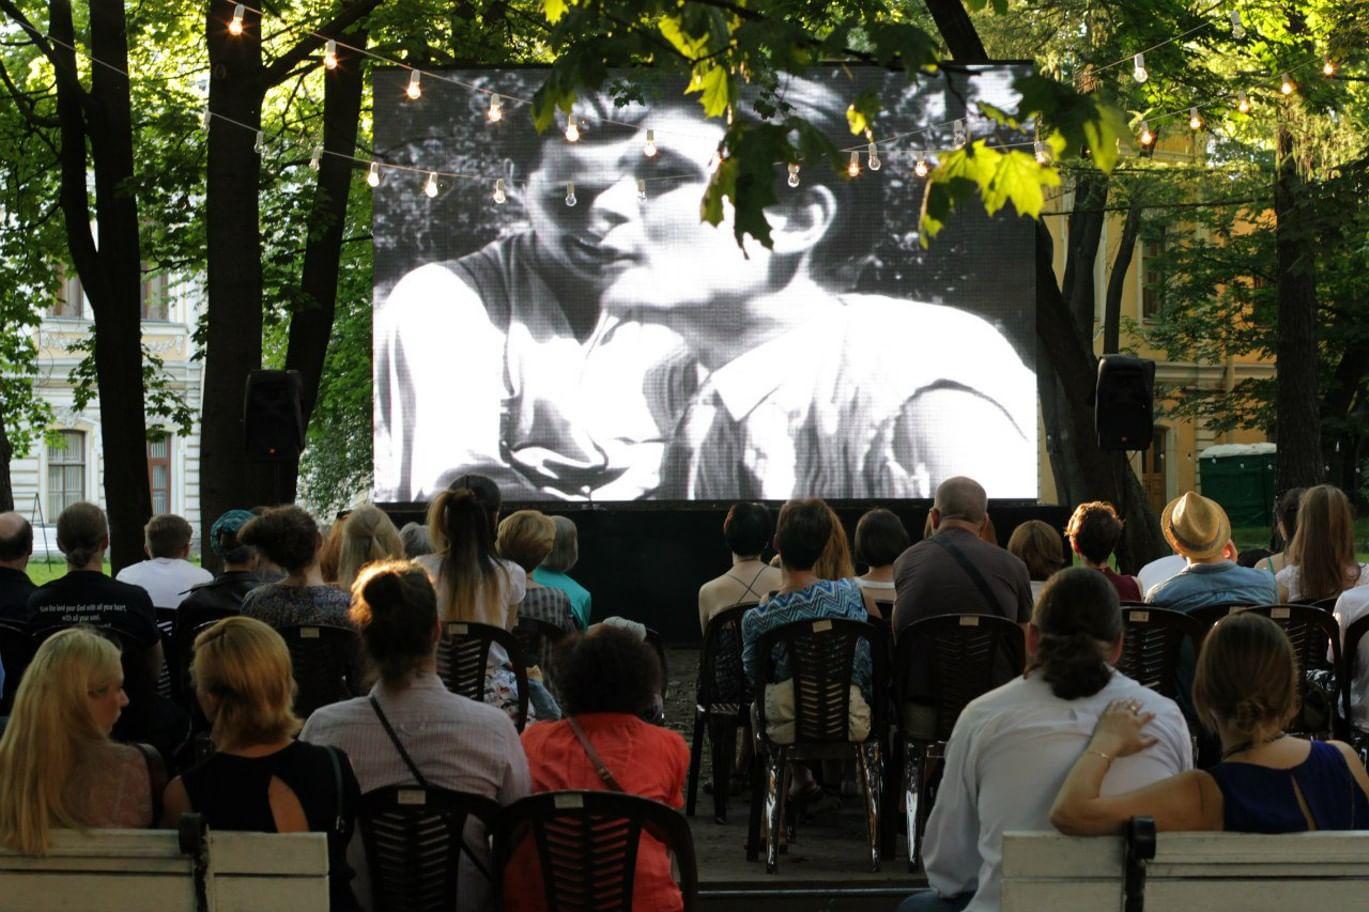 Фестиваль кино под открытым небом. Фотография: akhmatova.spb.ru